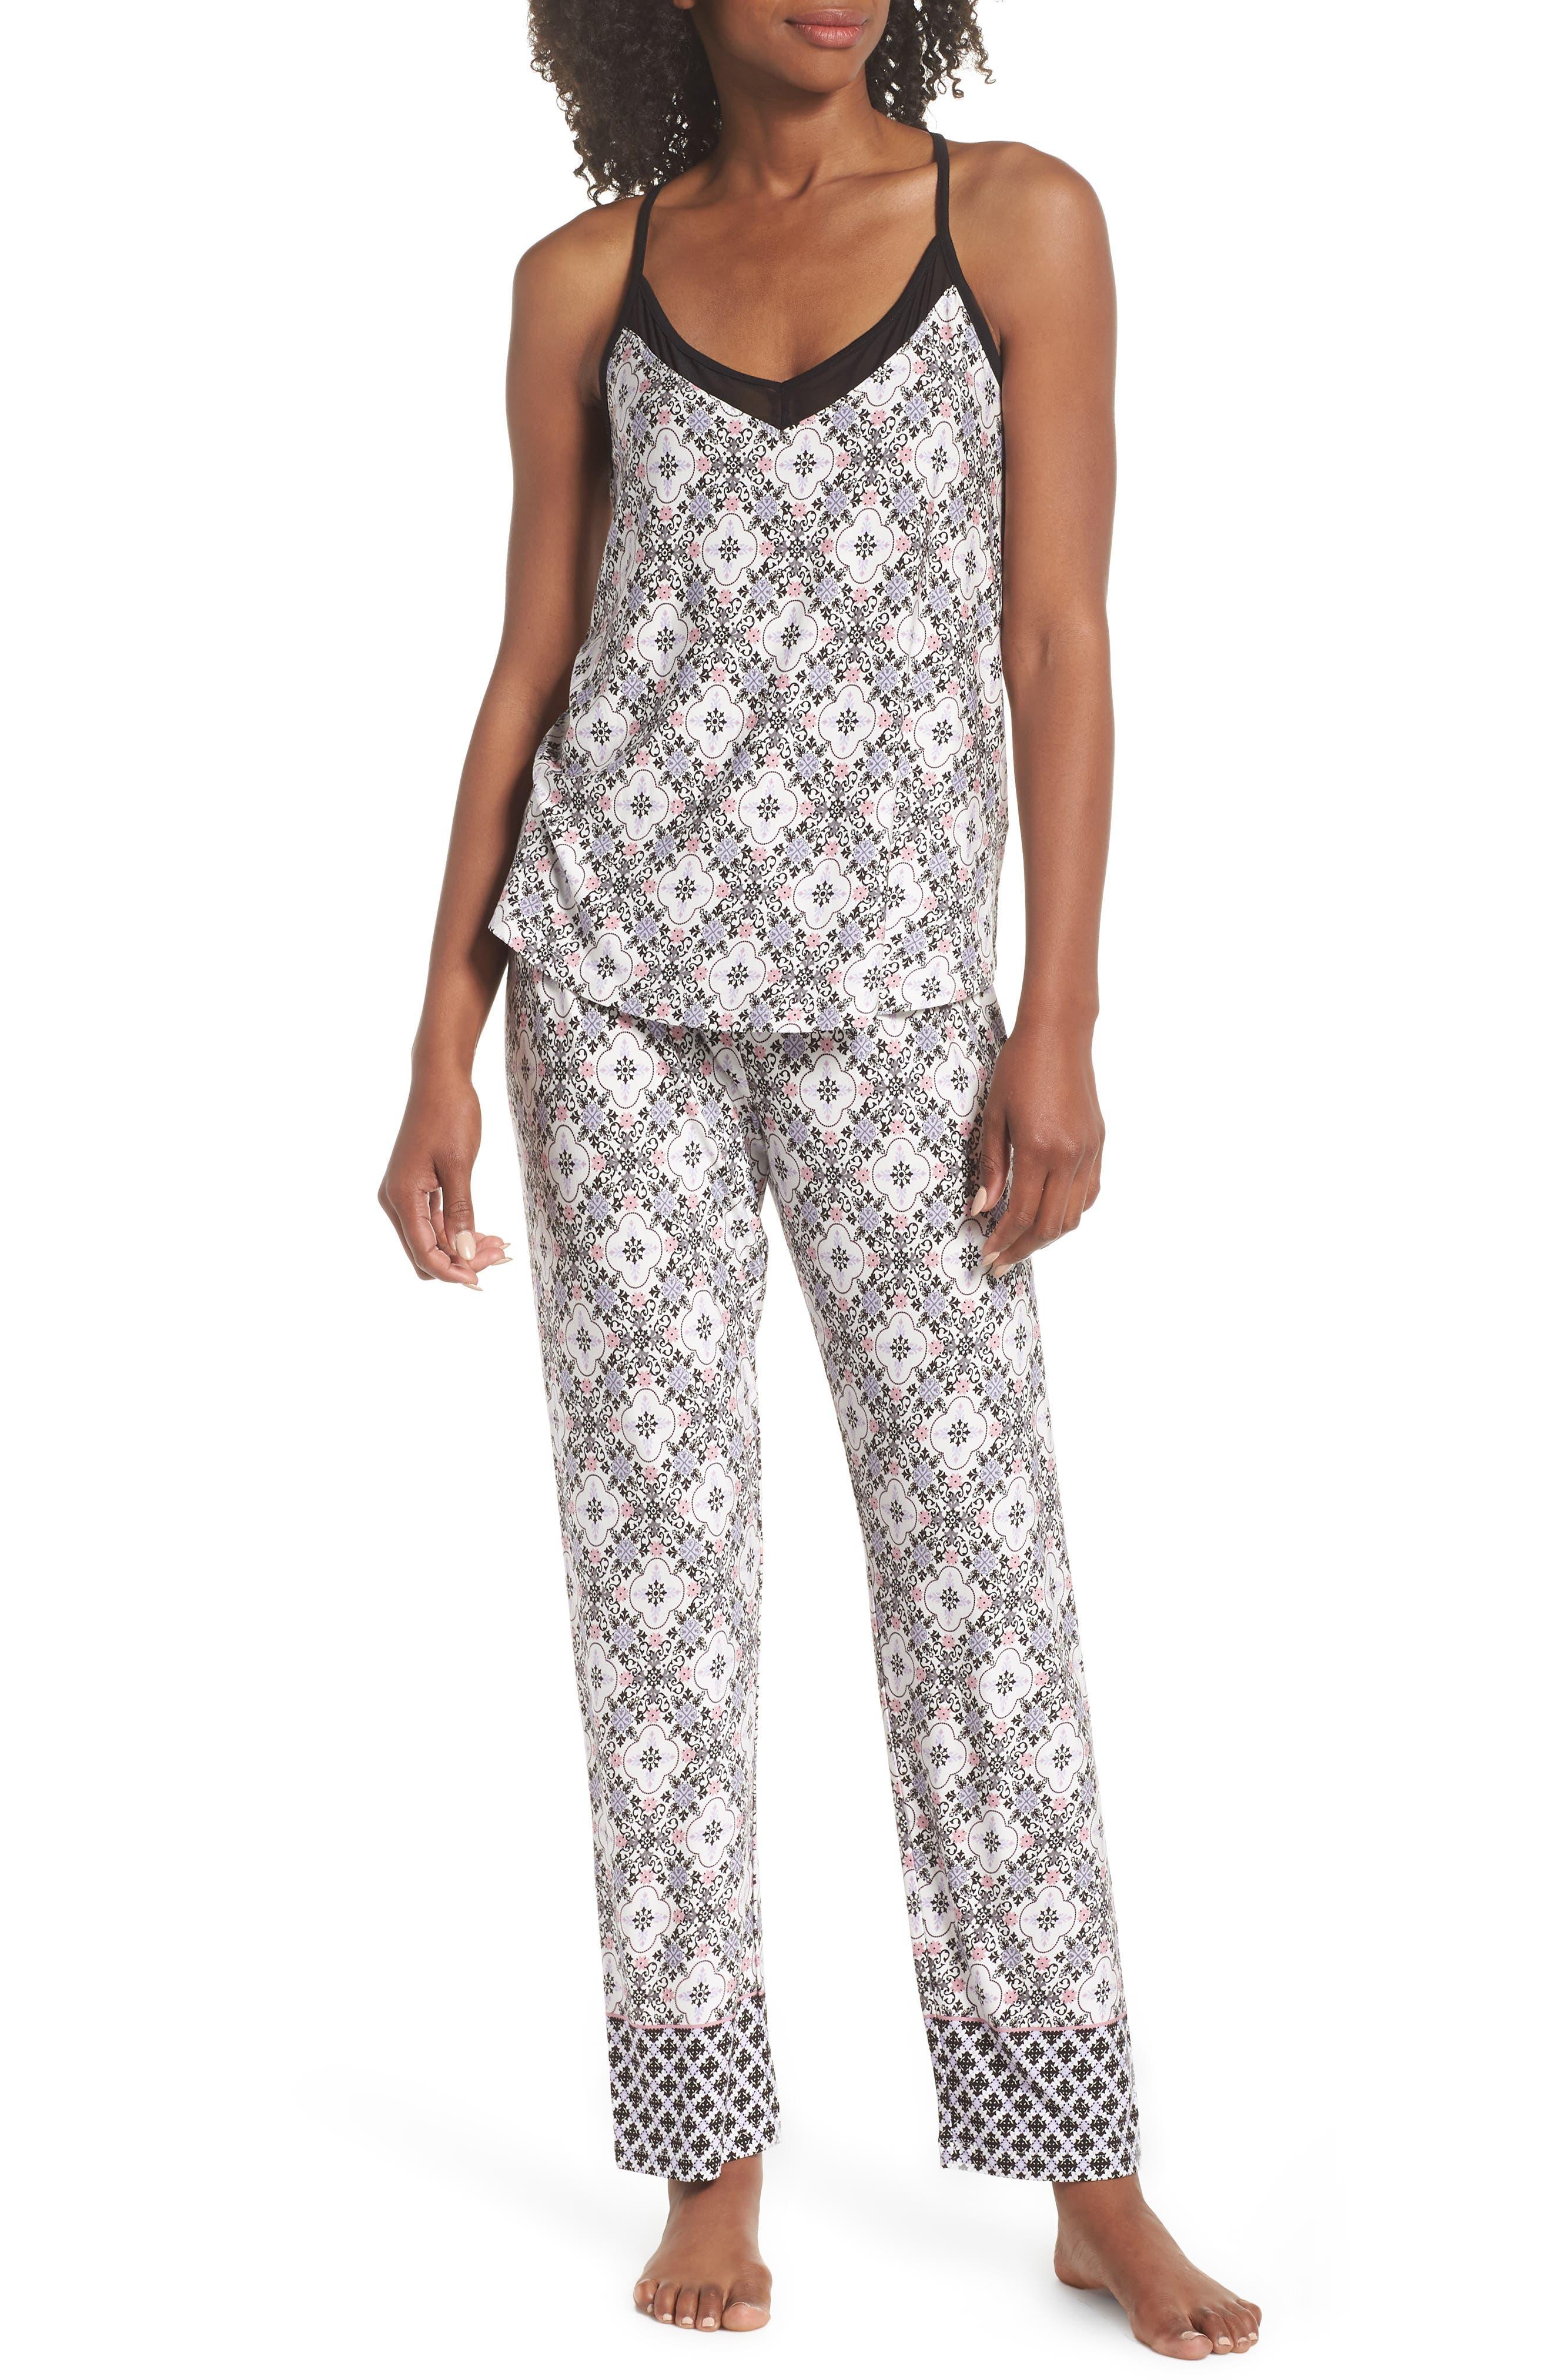 Ankle Pajama Pants,                             Alternate thumbnail 7, color,                             901